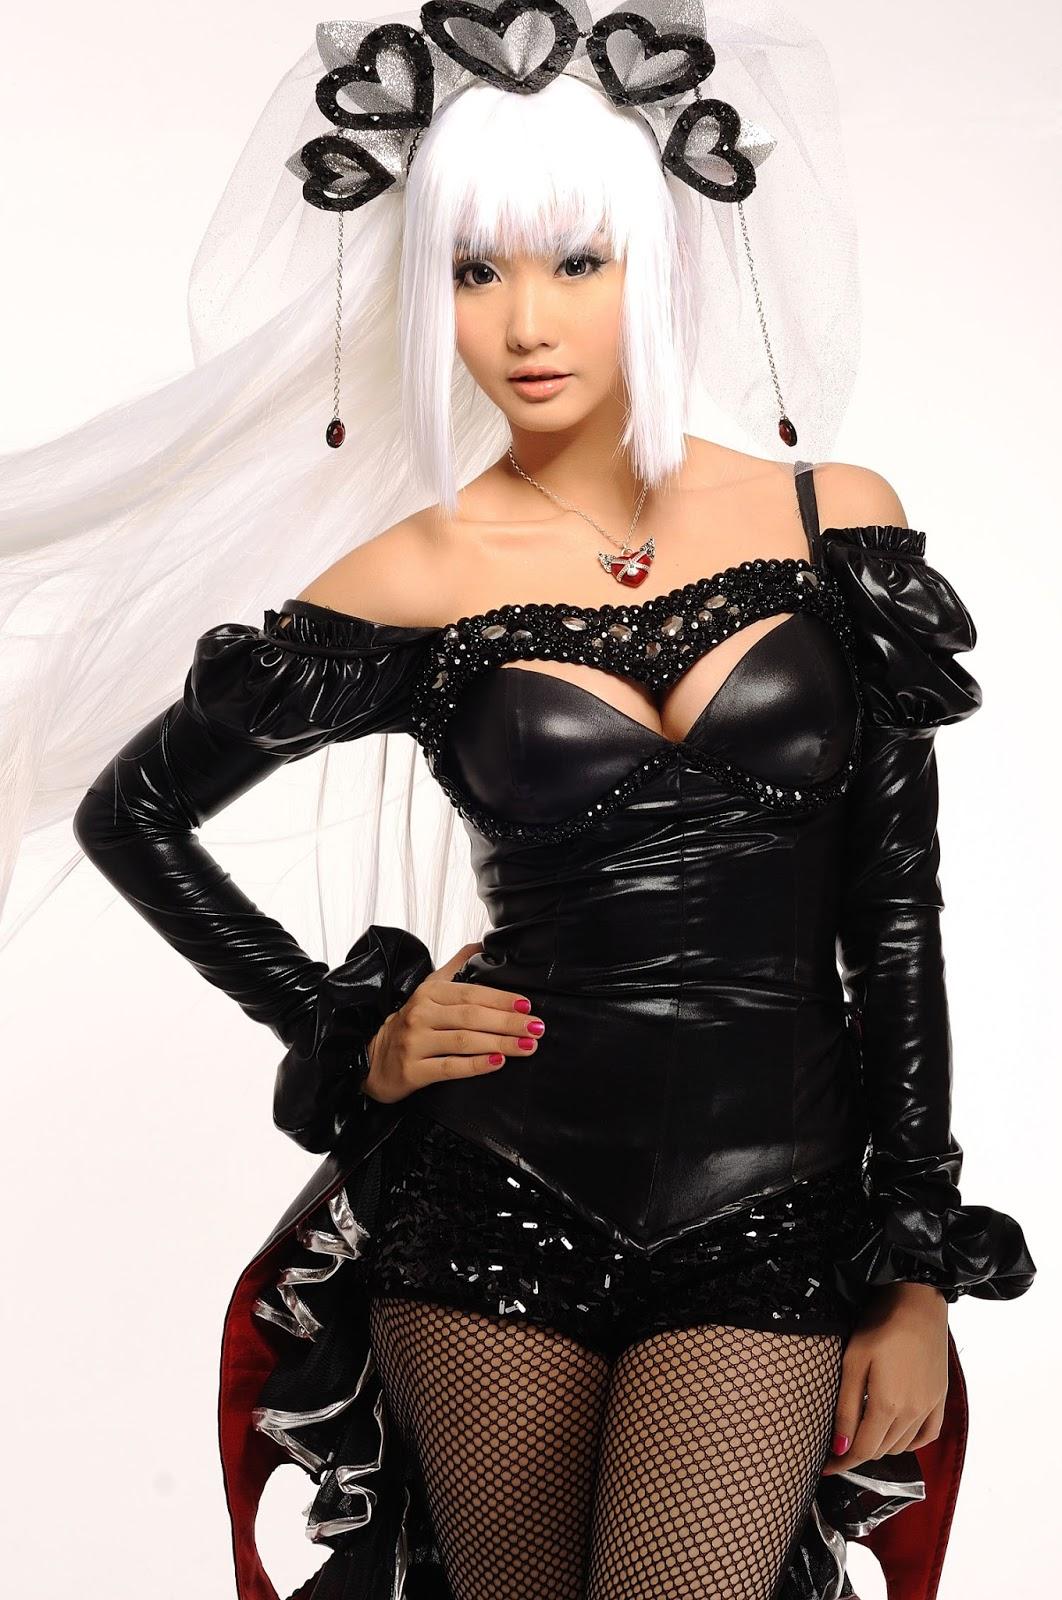 alodia gosiengfiao sexy cosplay pics 01